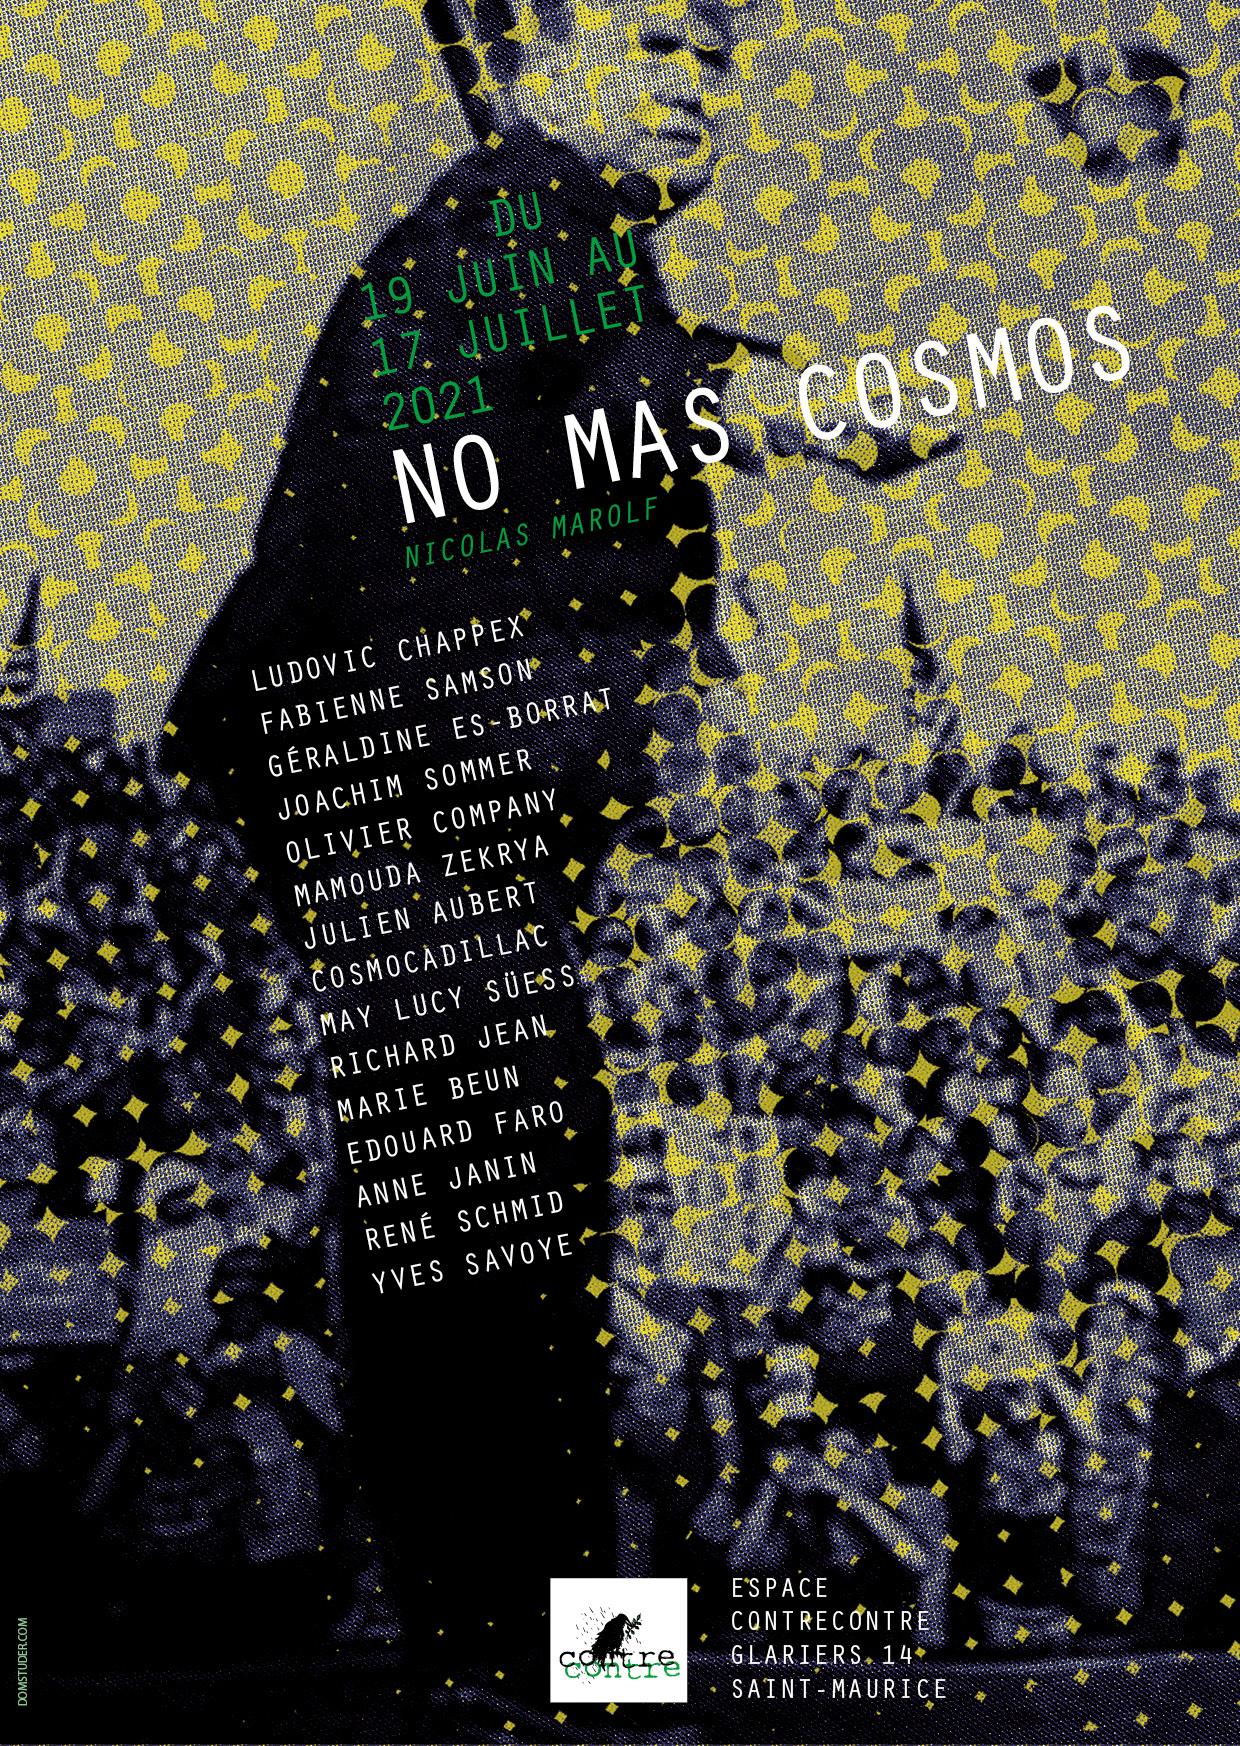 No Mas Cosmos